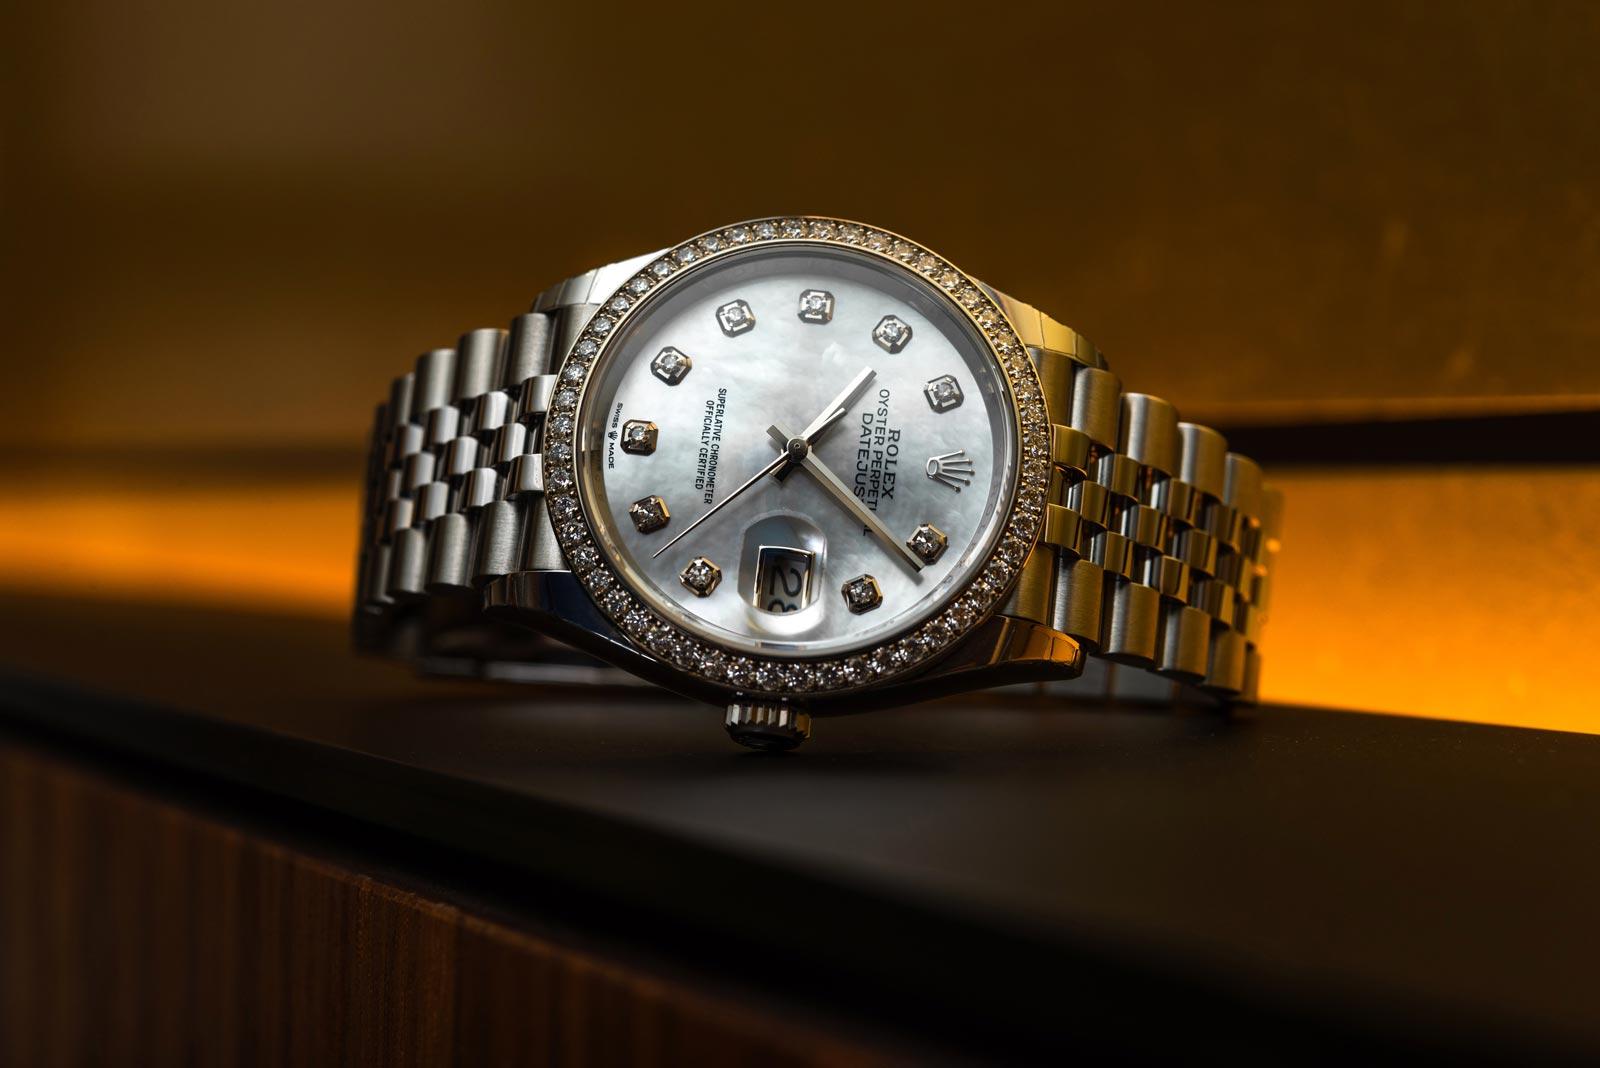 Rolex Datejust 36 <br> Referencia 126284RBR